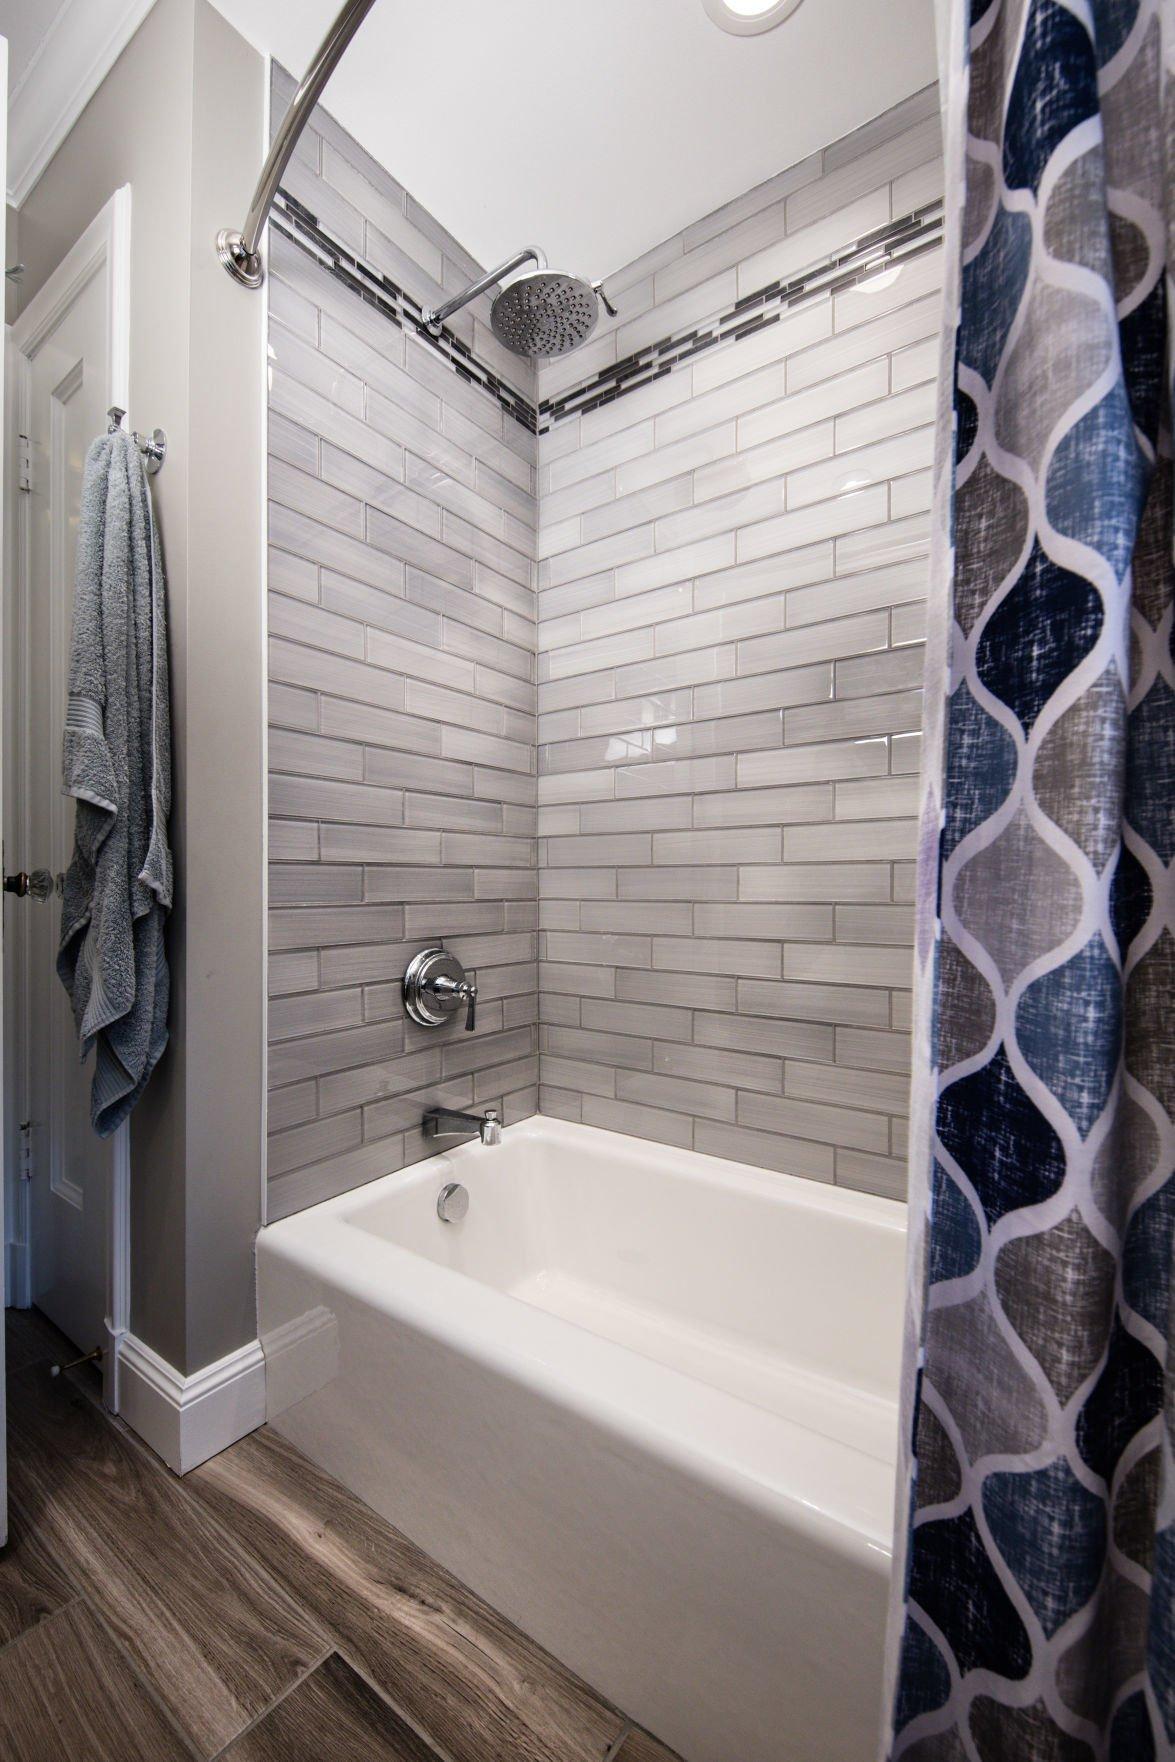 Eichhorn_Bathroom--2_74293.jpg